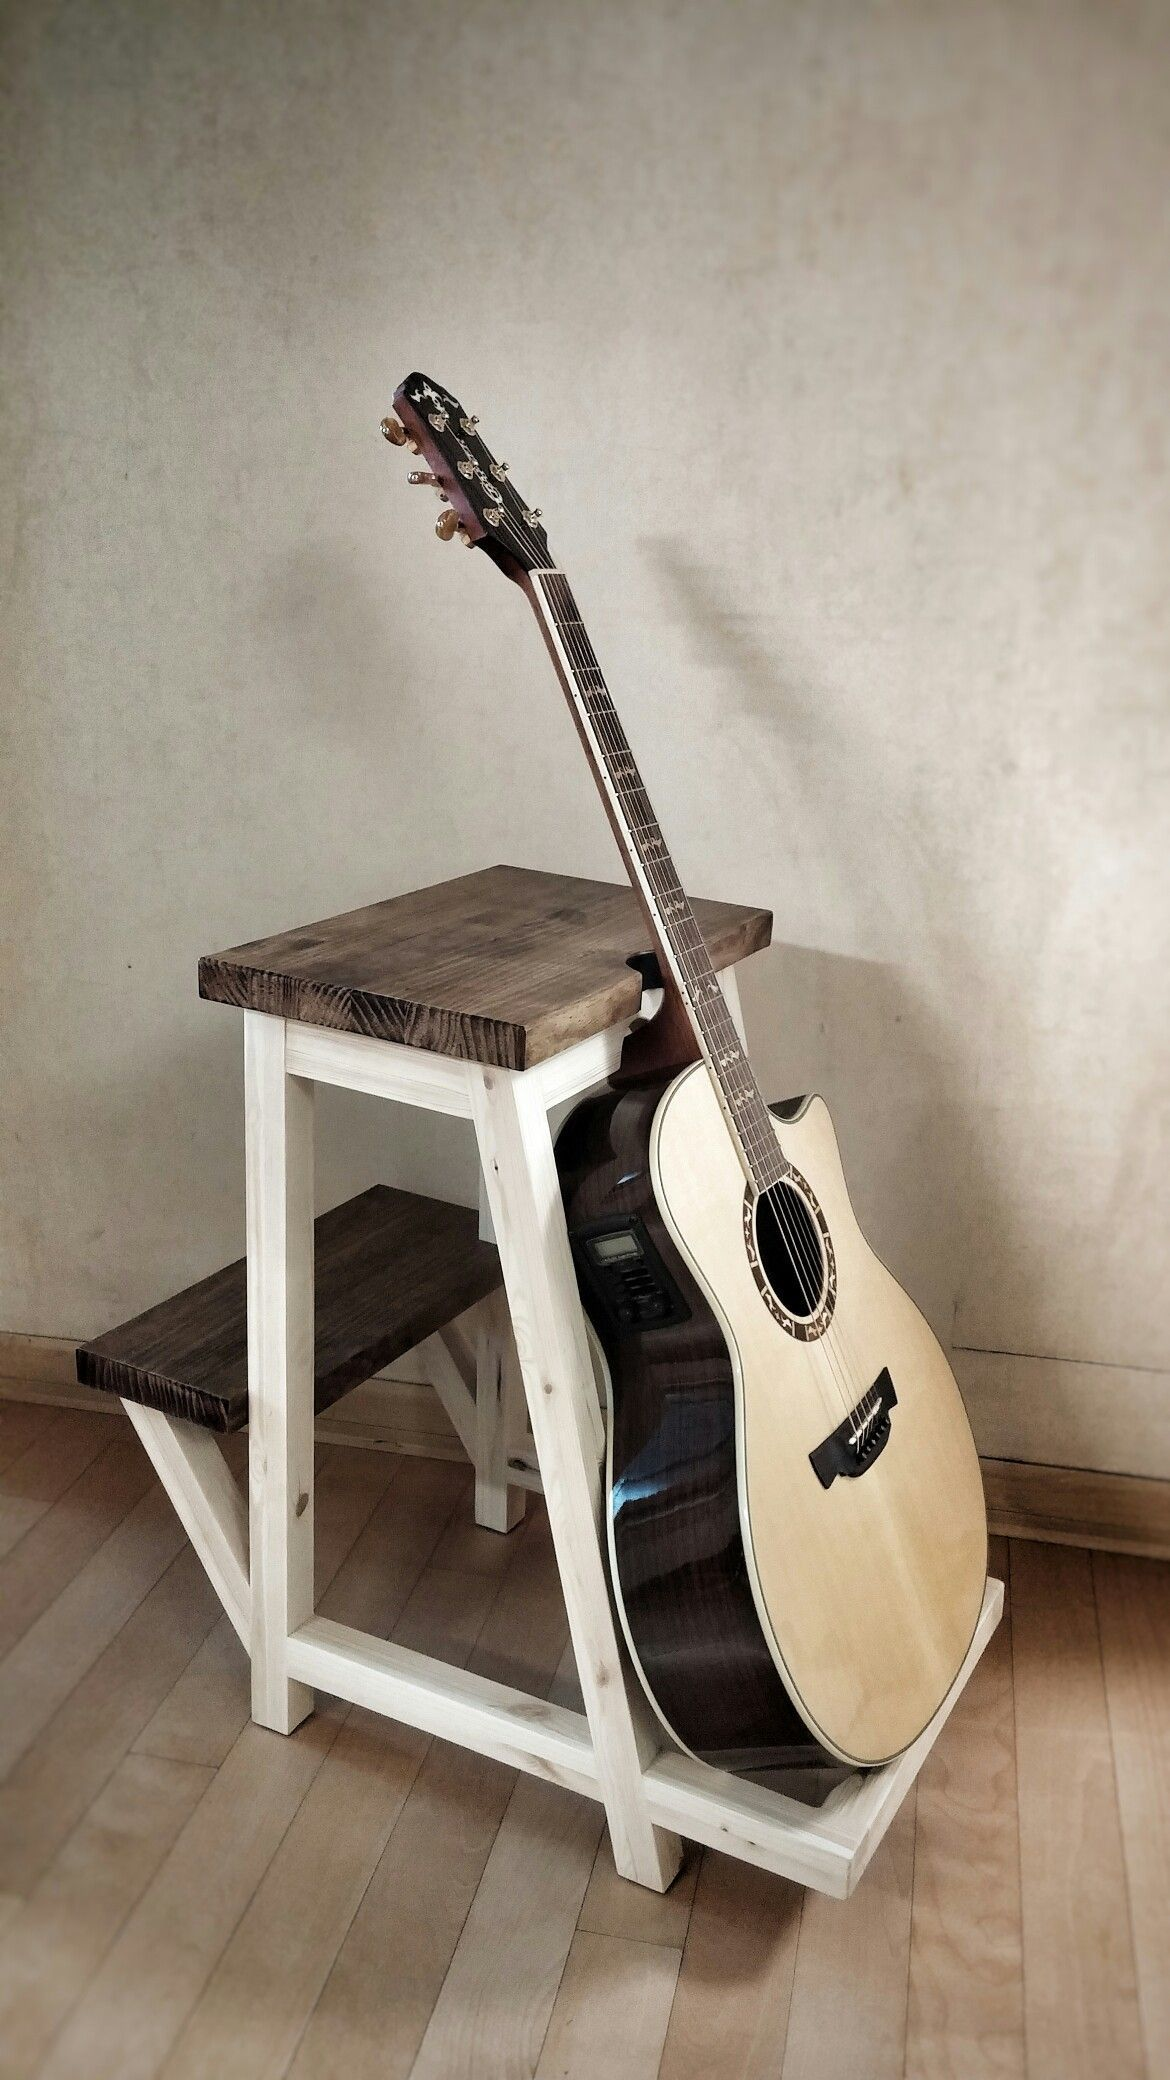 Guitar Stool Repurposedfurniturechair Wooden Guitar Stand Diy Guitar Stand Music Furniture